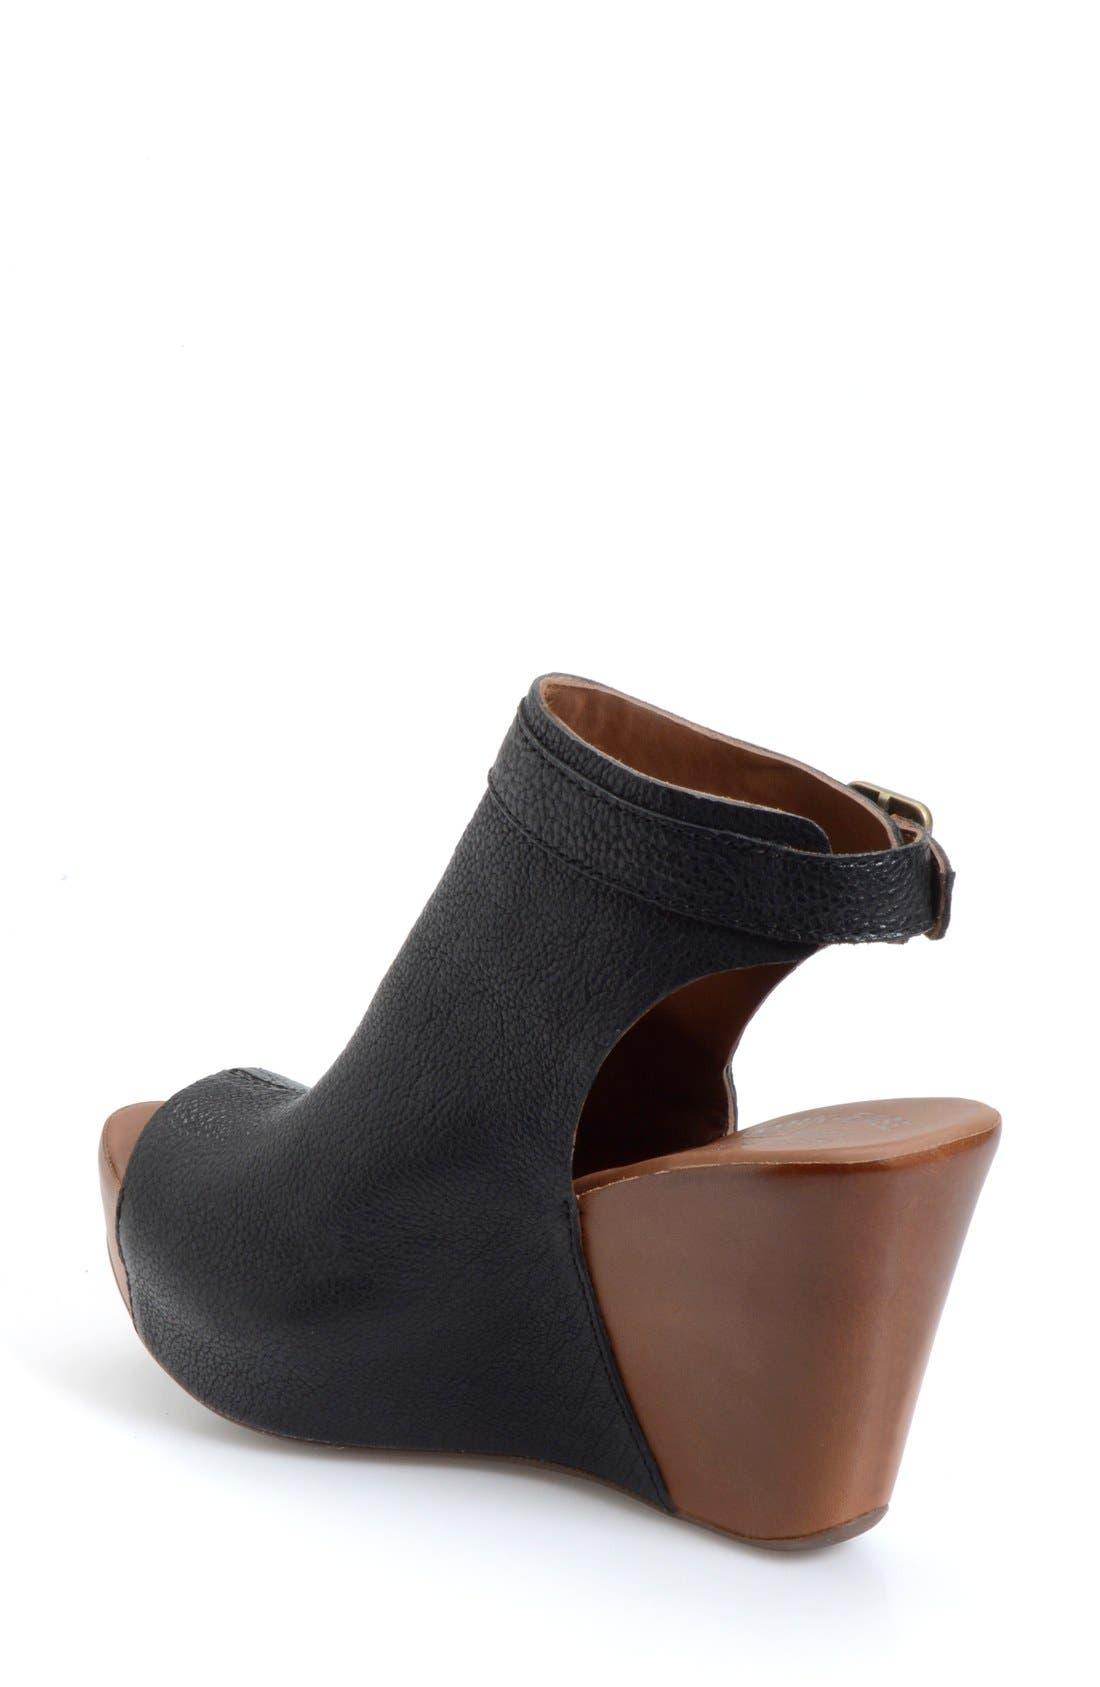 'Berit' Wedge Sandal,                             Alternate thumbnail 31, color,